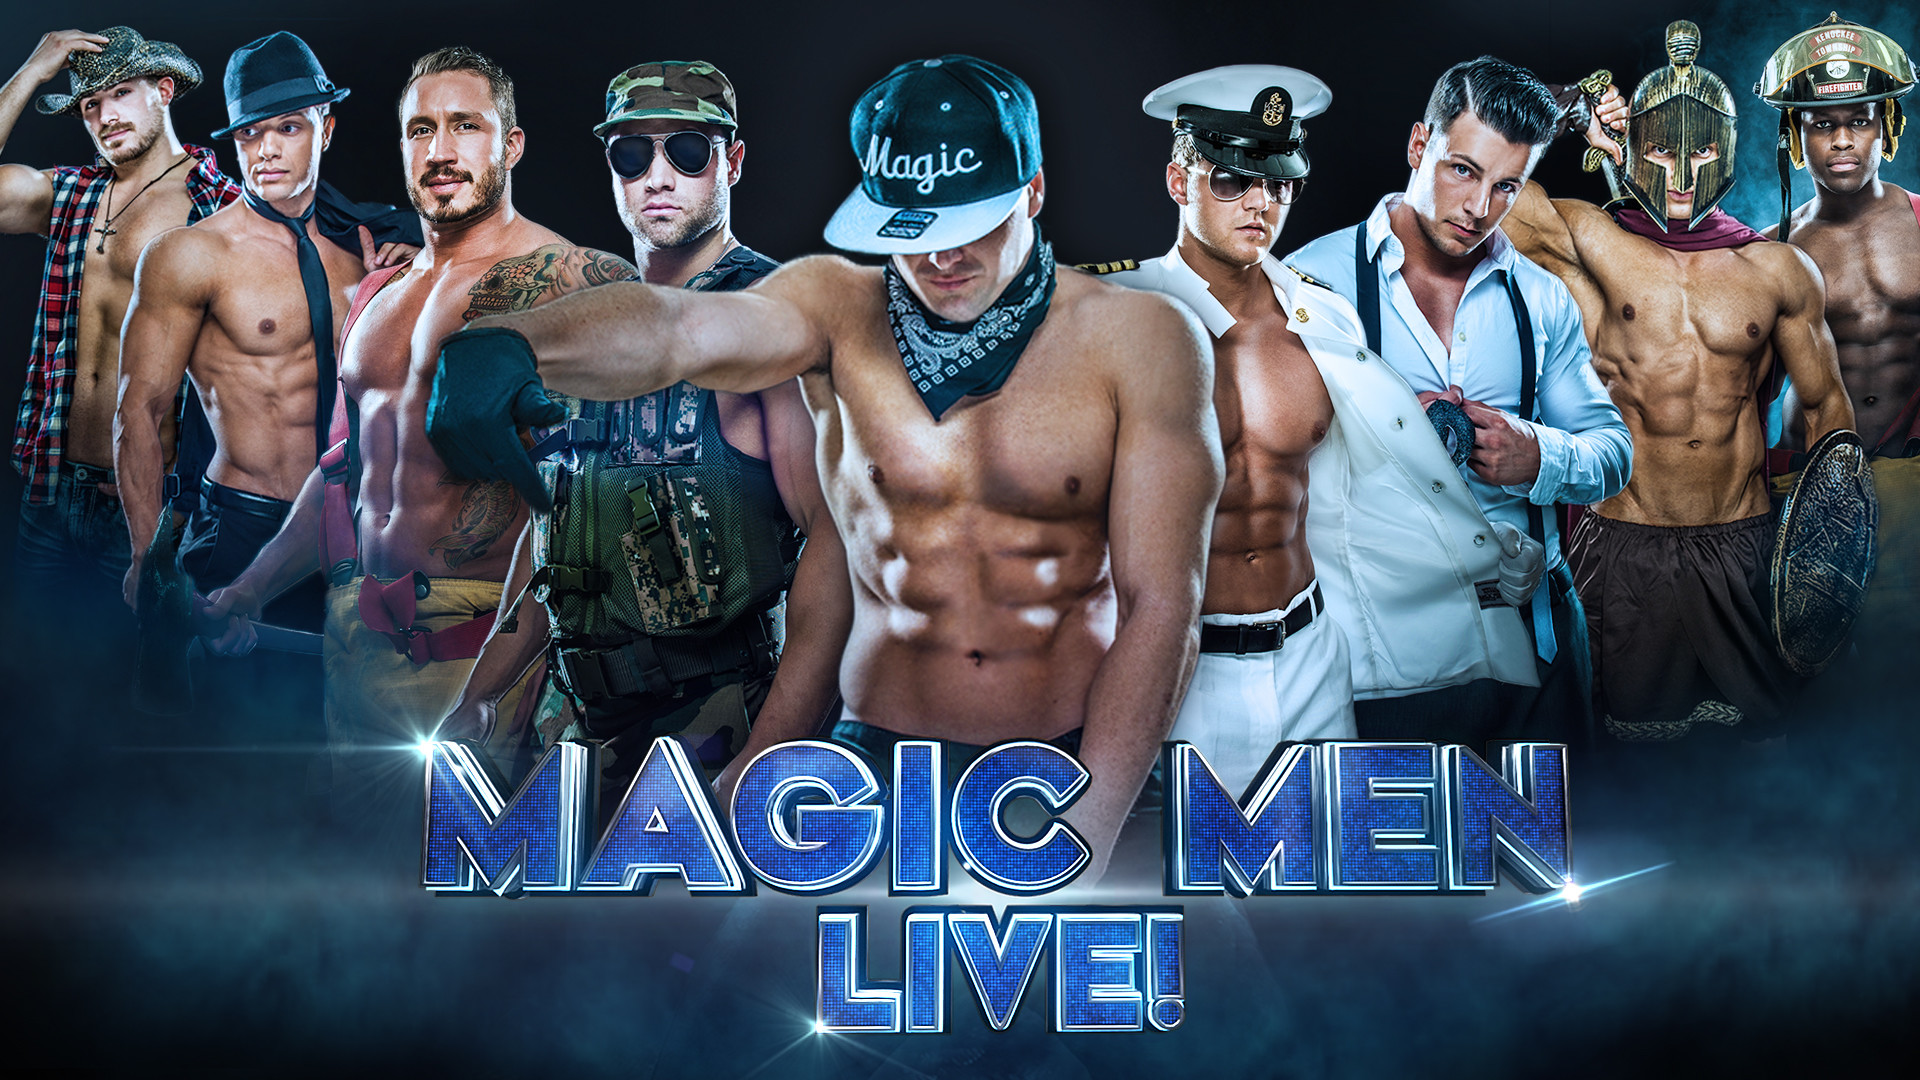 magic mike xxl free download